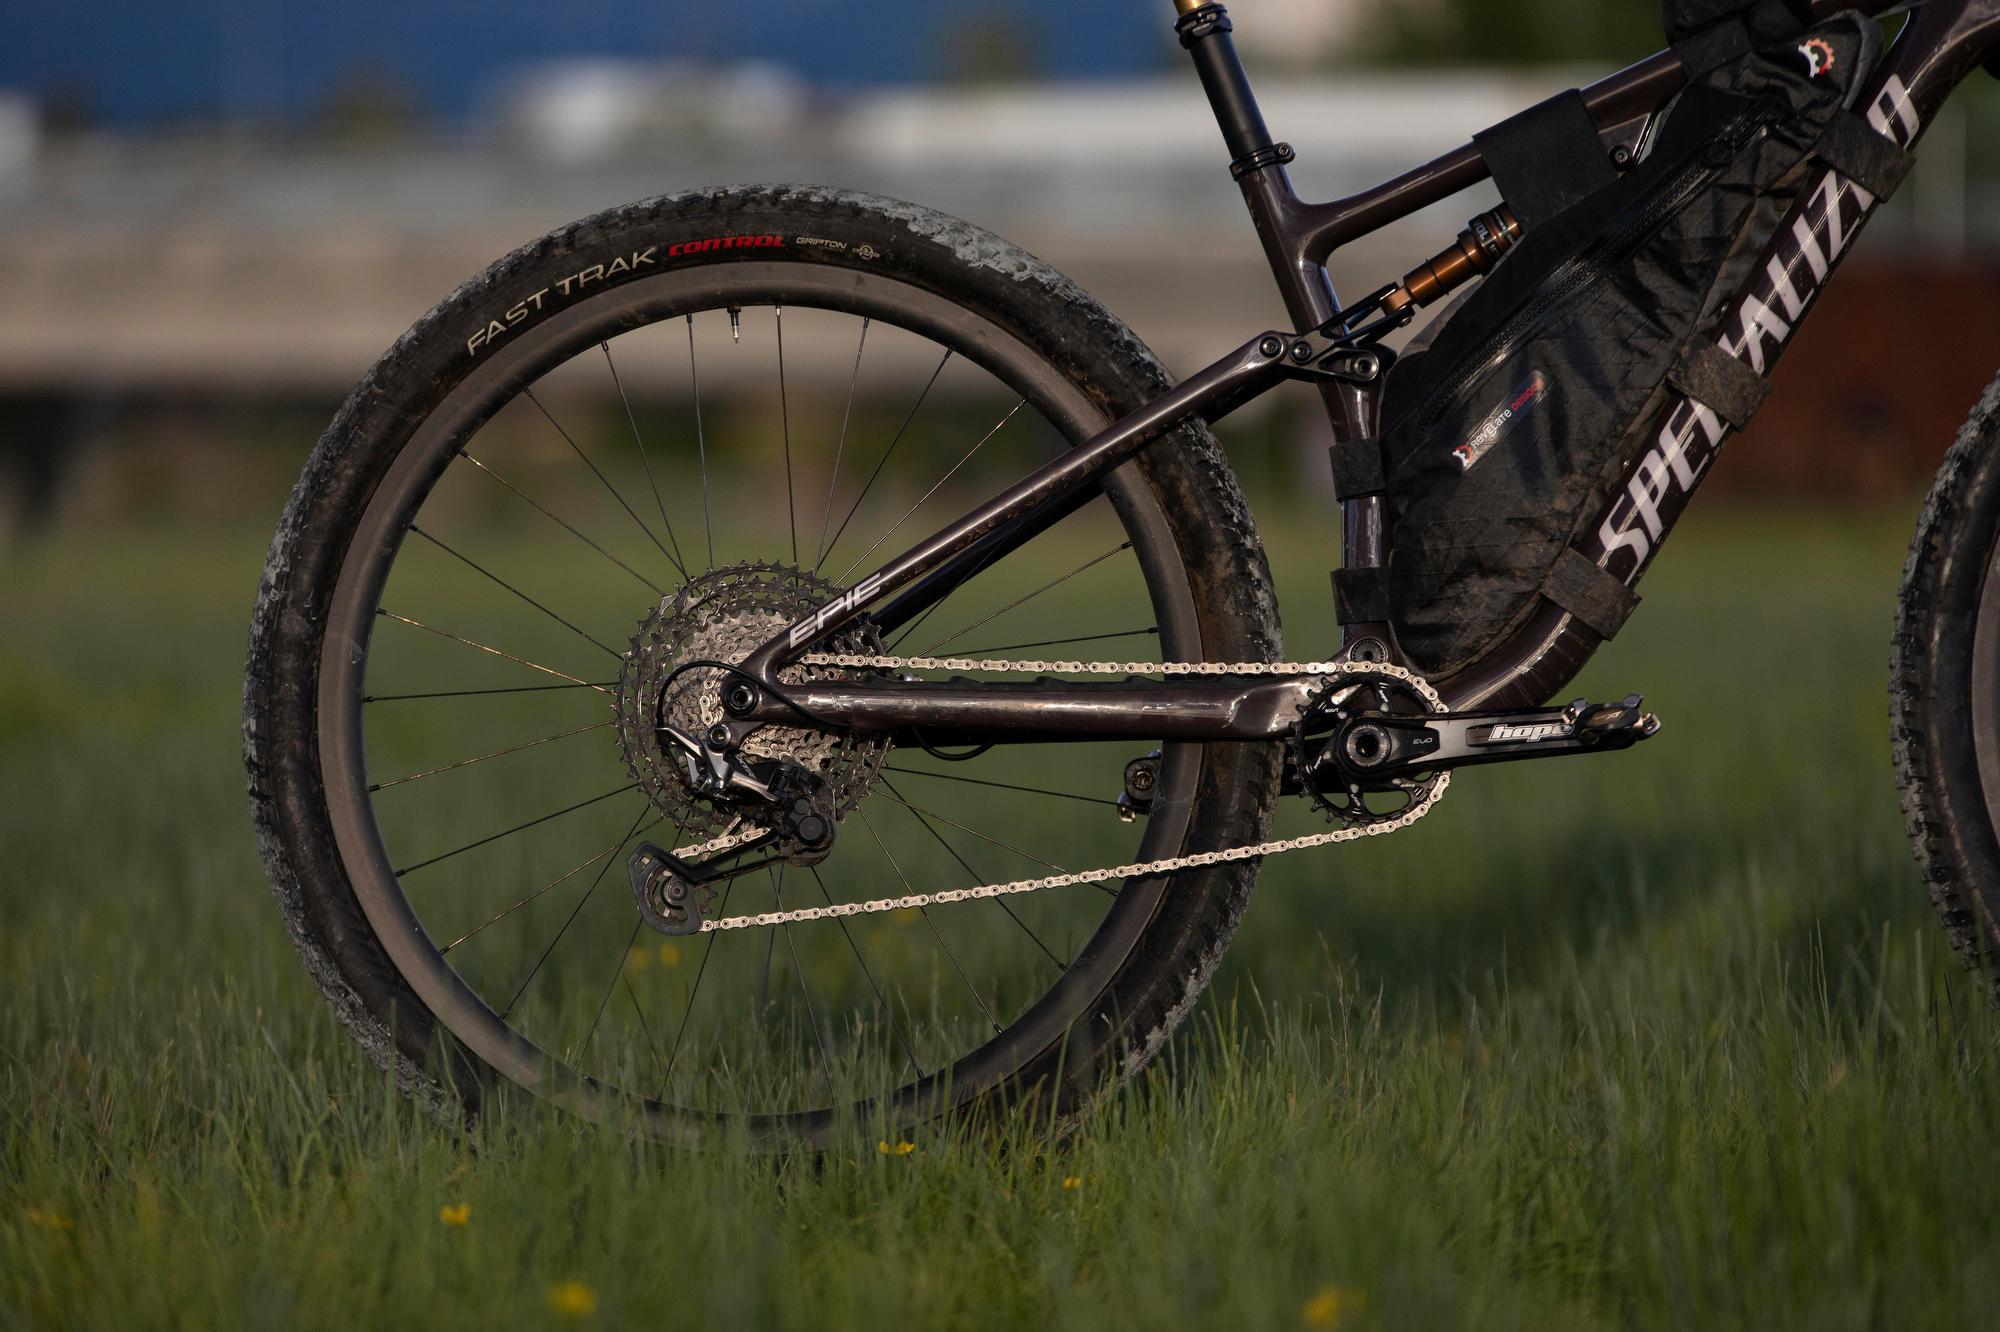 Lael Wilcox Kenai 250 Bike & Gear 025